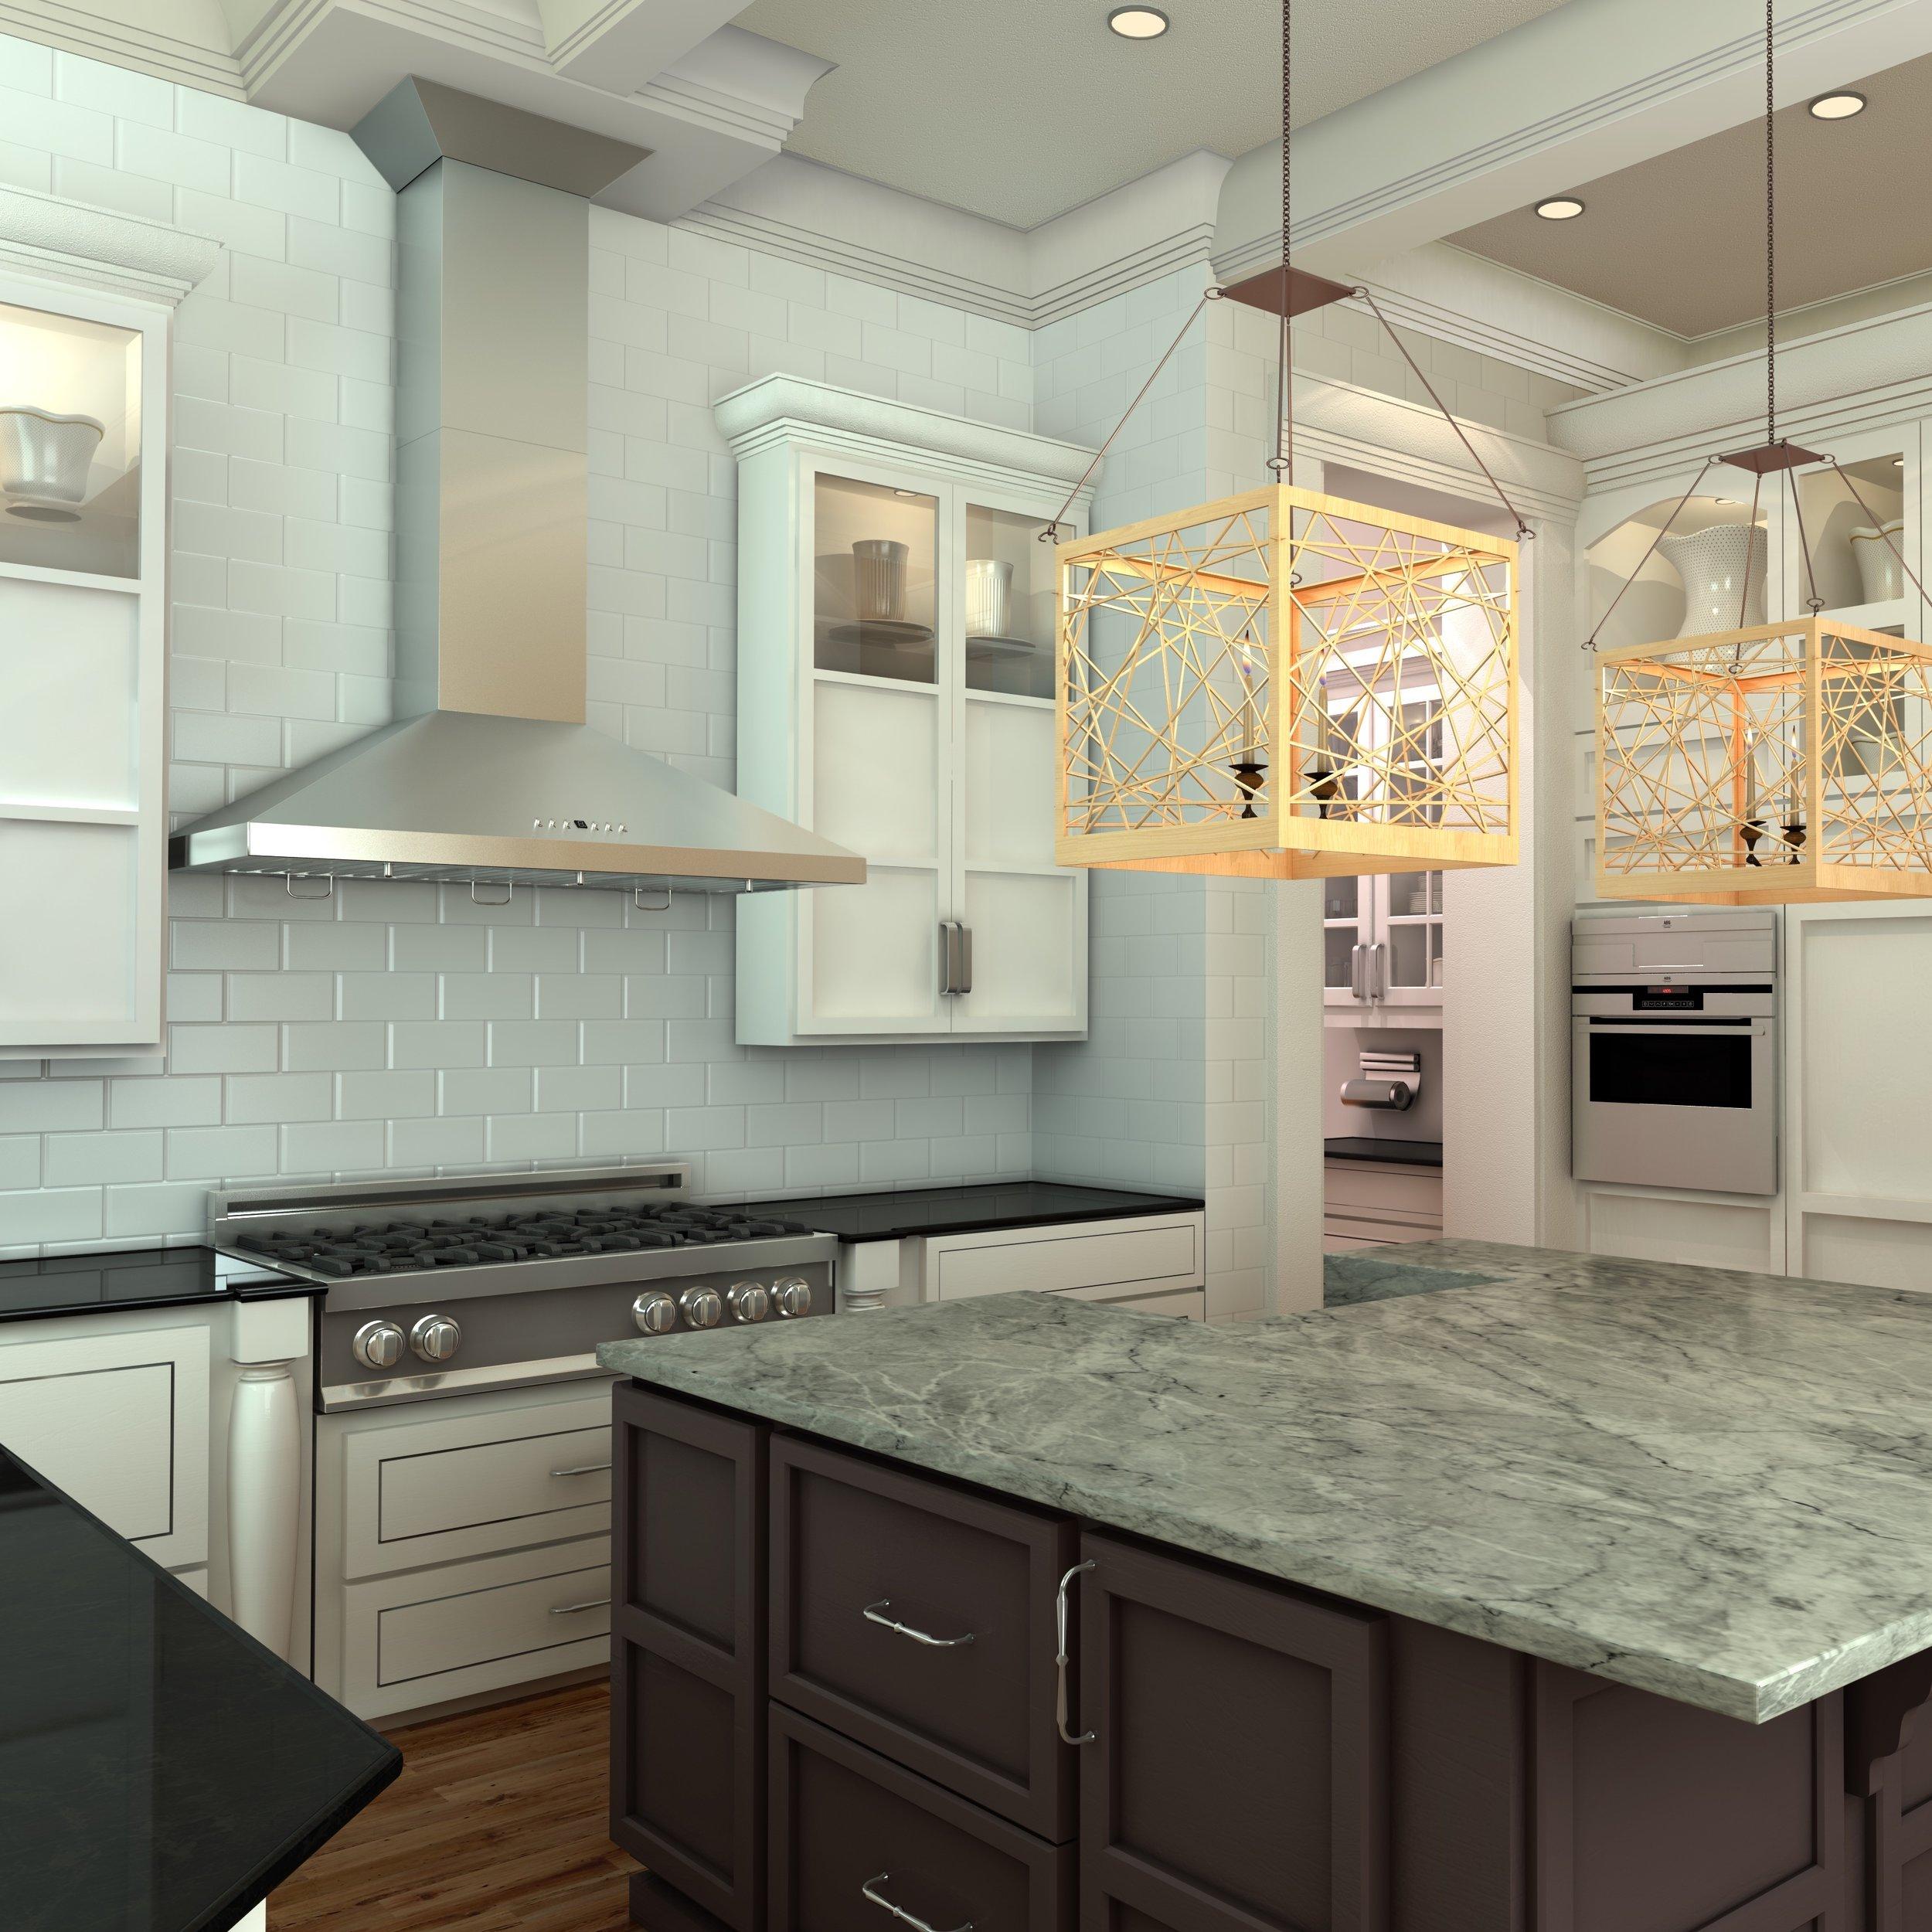 zline-stainless-steel-wall-mounted-range-hood-KL2-kitchen 1.jpeg